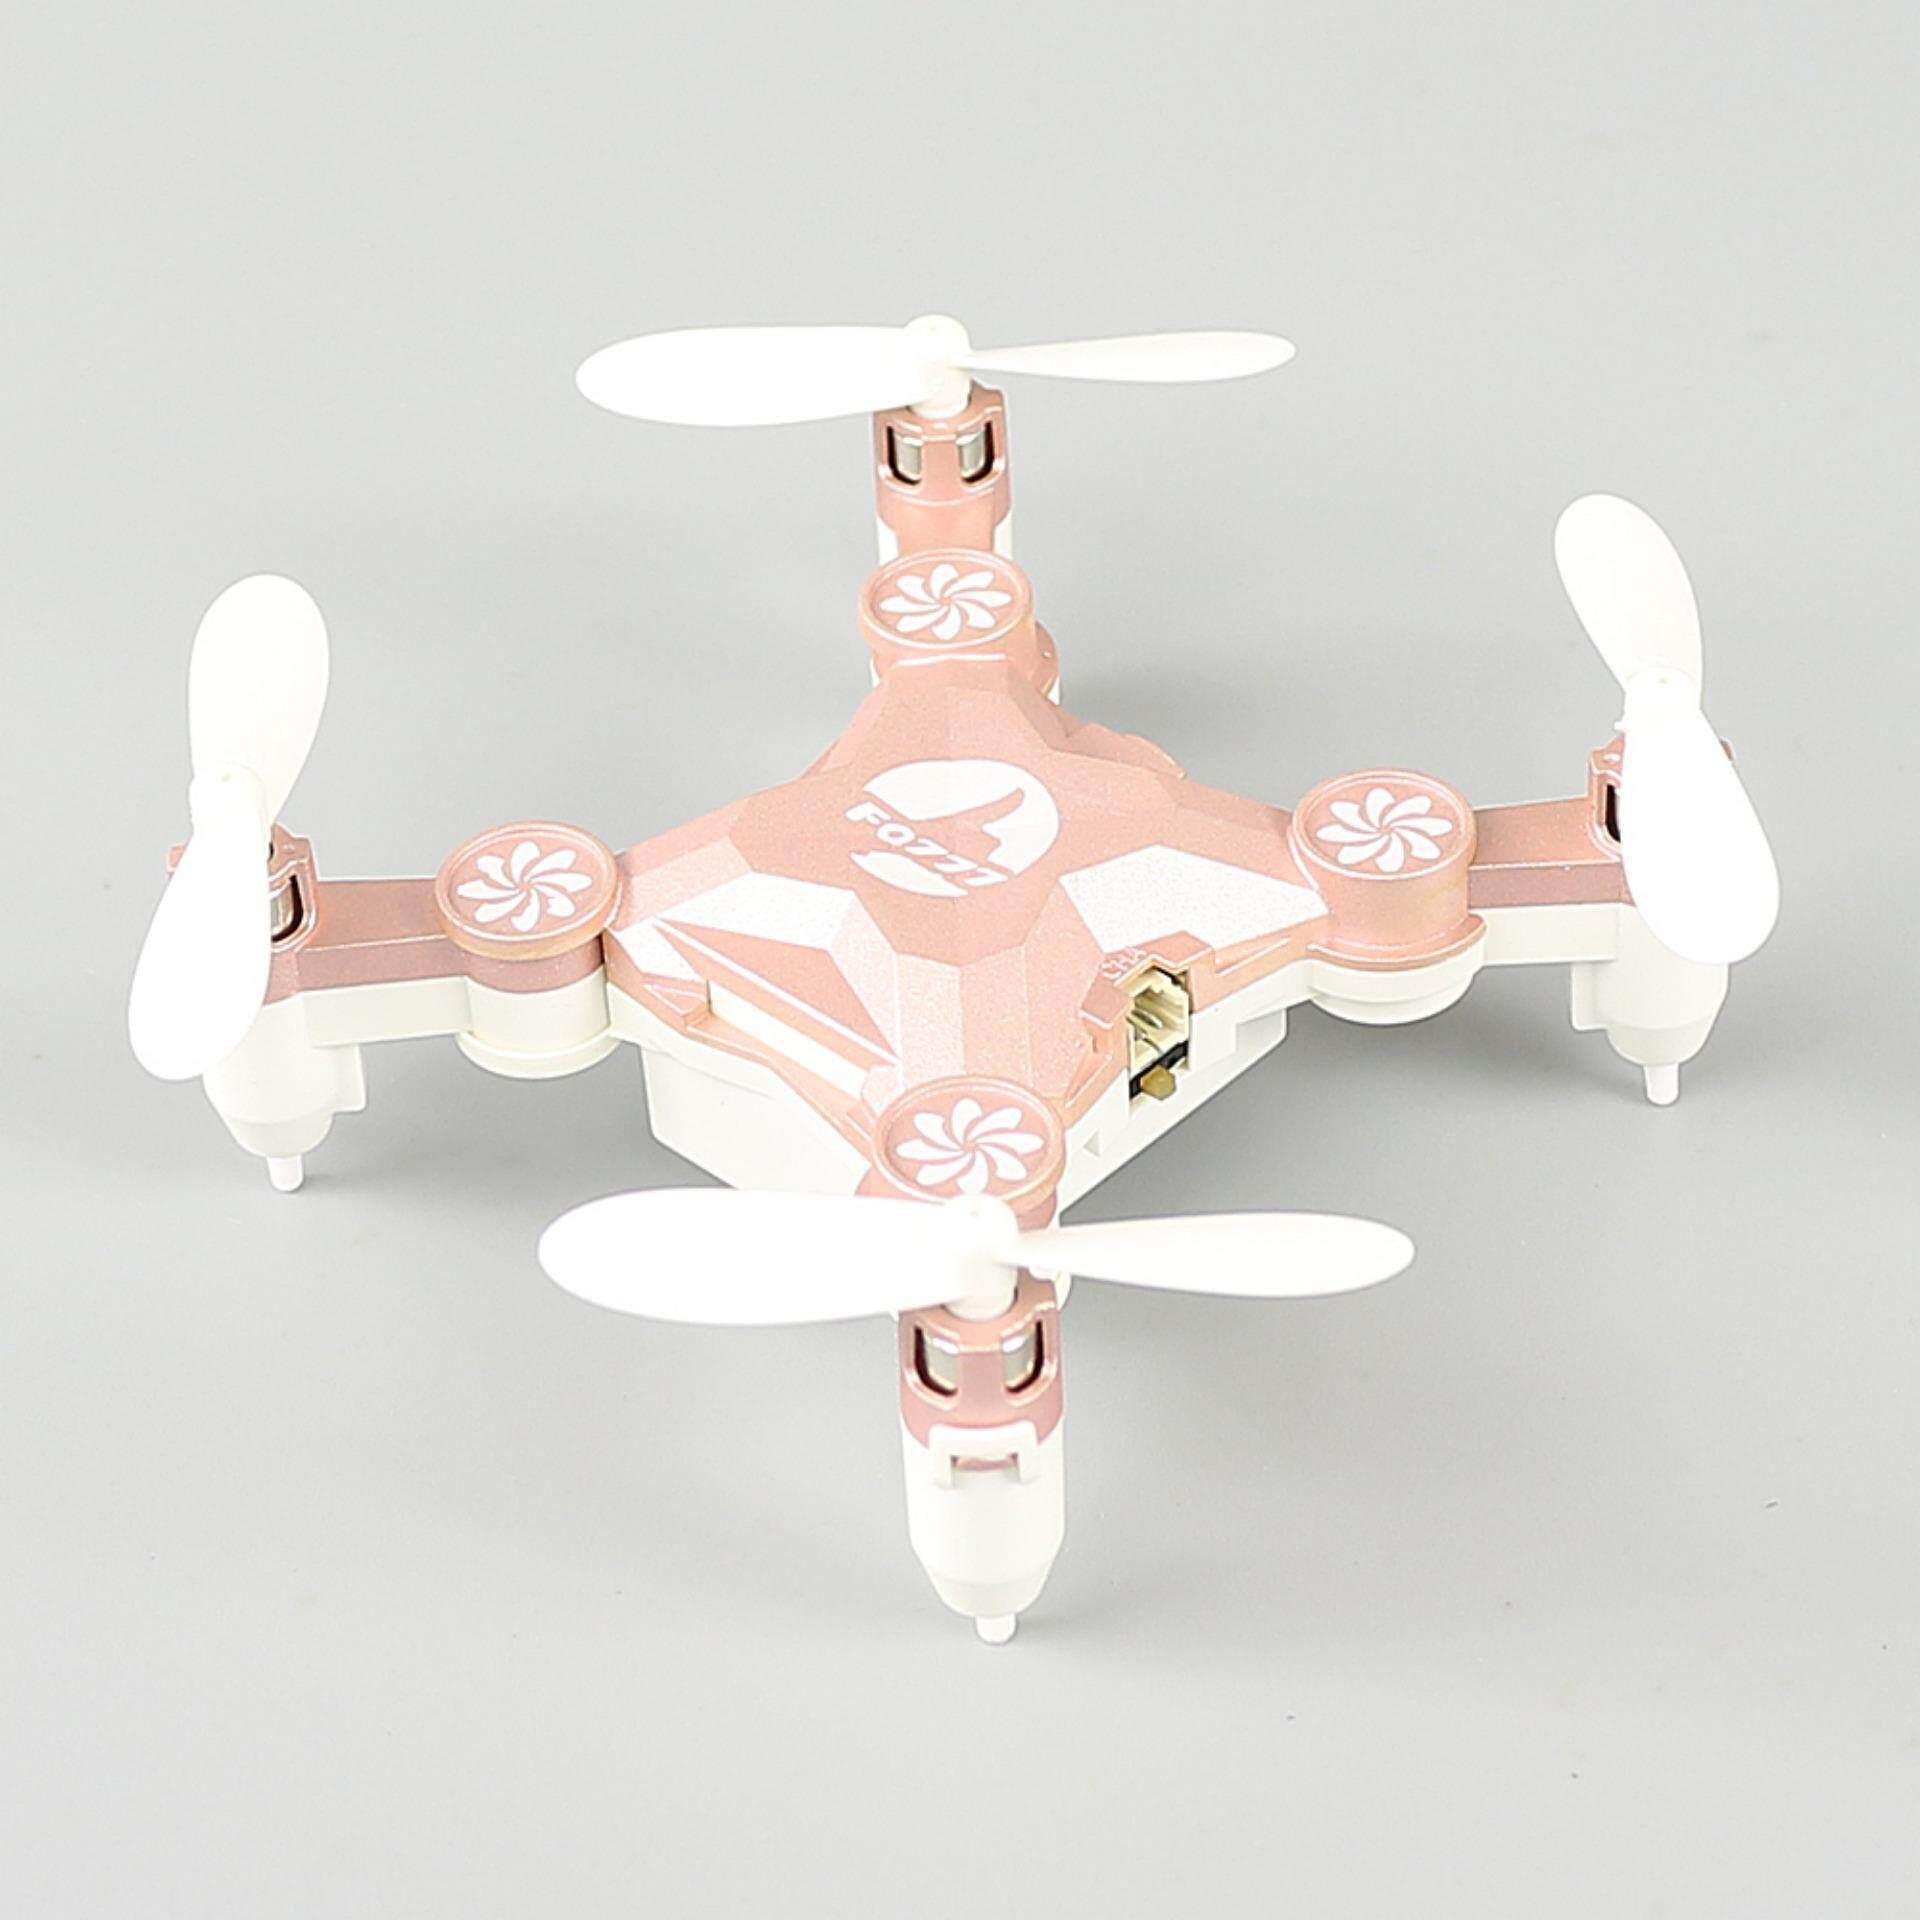 Jjrc H8 Mini Drone Untuk Pemula Dengan Fitur Headless Warna Putih Rc Mikro Micro Quadcopter 2 Mode Kecepatan Nihui Nh010 6 Axis Gyro Pesaing Furibee Eachine E010 E012 H36 Detail Gambar Jingle Fq777 Fq11 Control Remoto Helicoptero Modo Terbaru